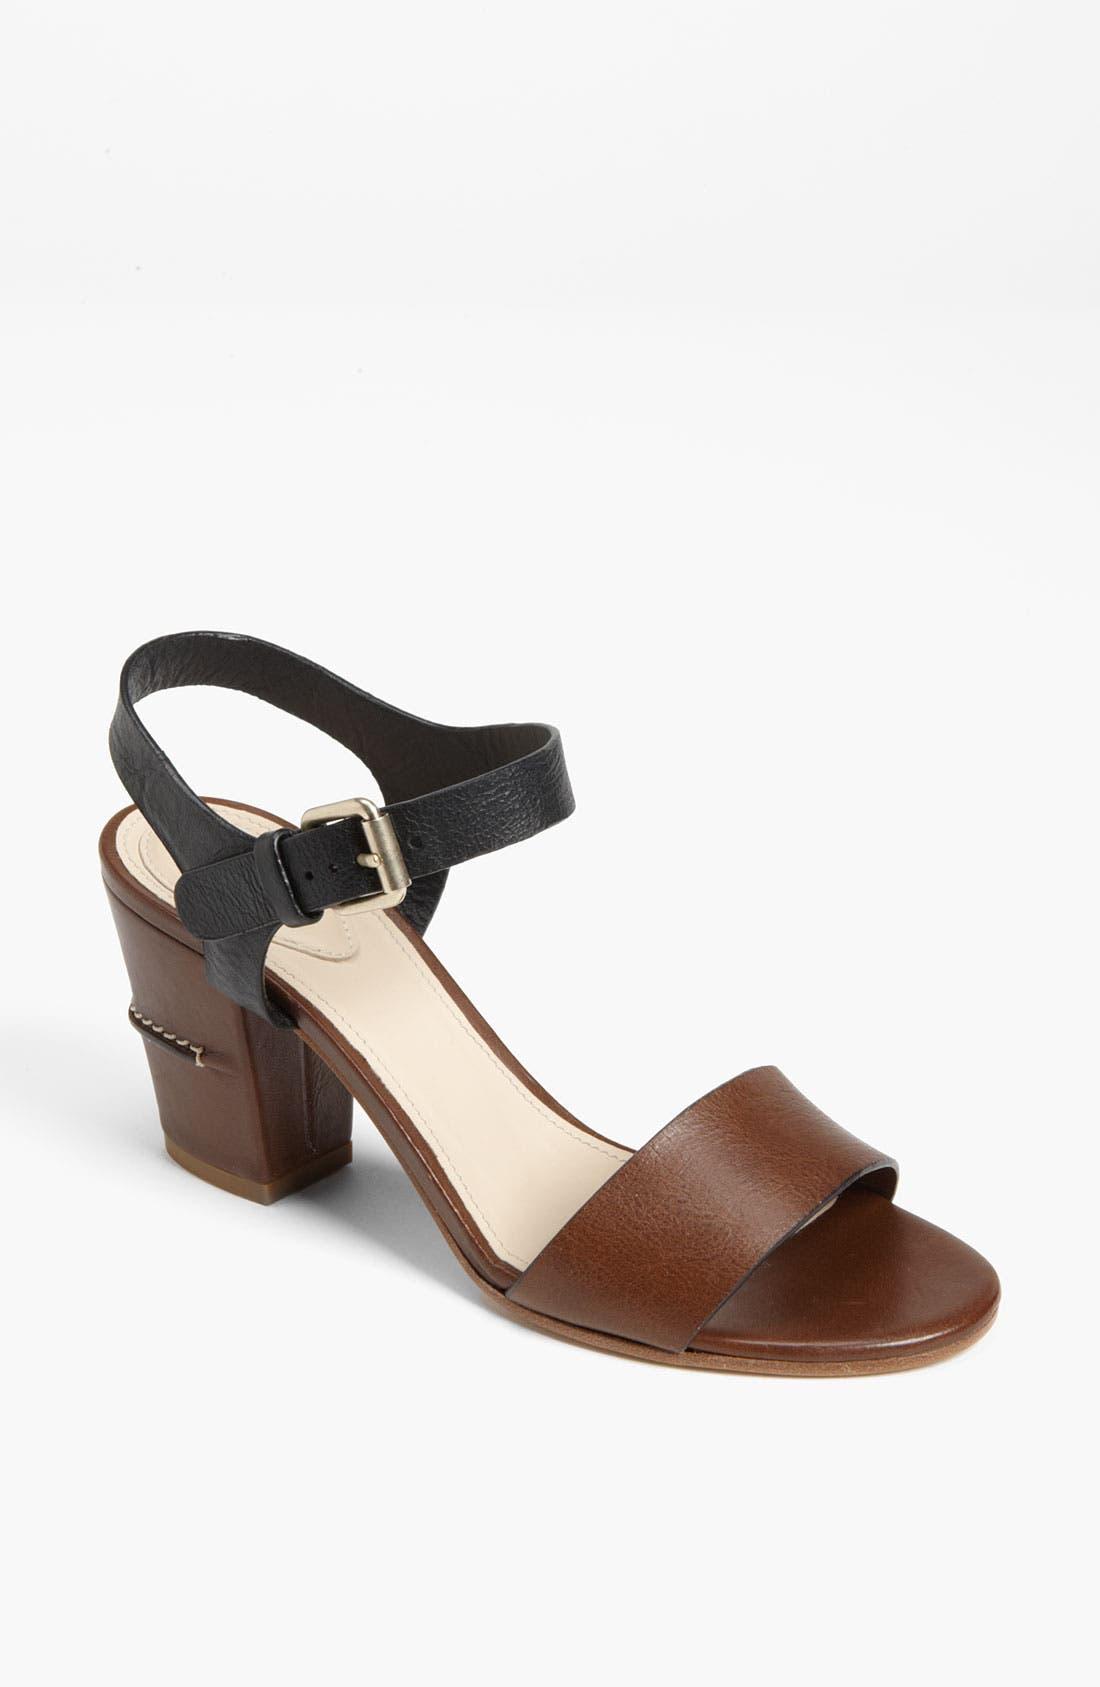 Main Image - Chloé 'Heloise' Sandal